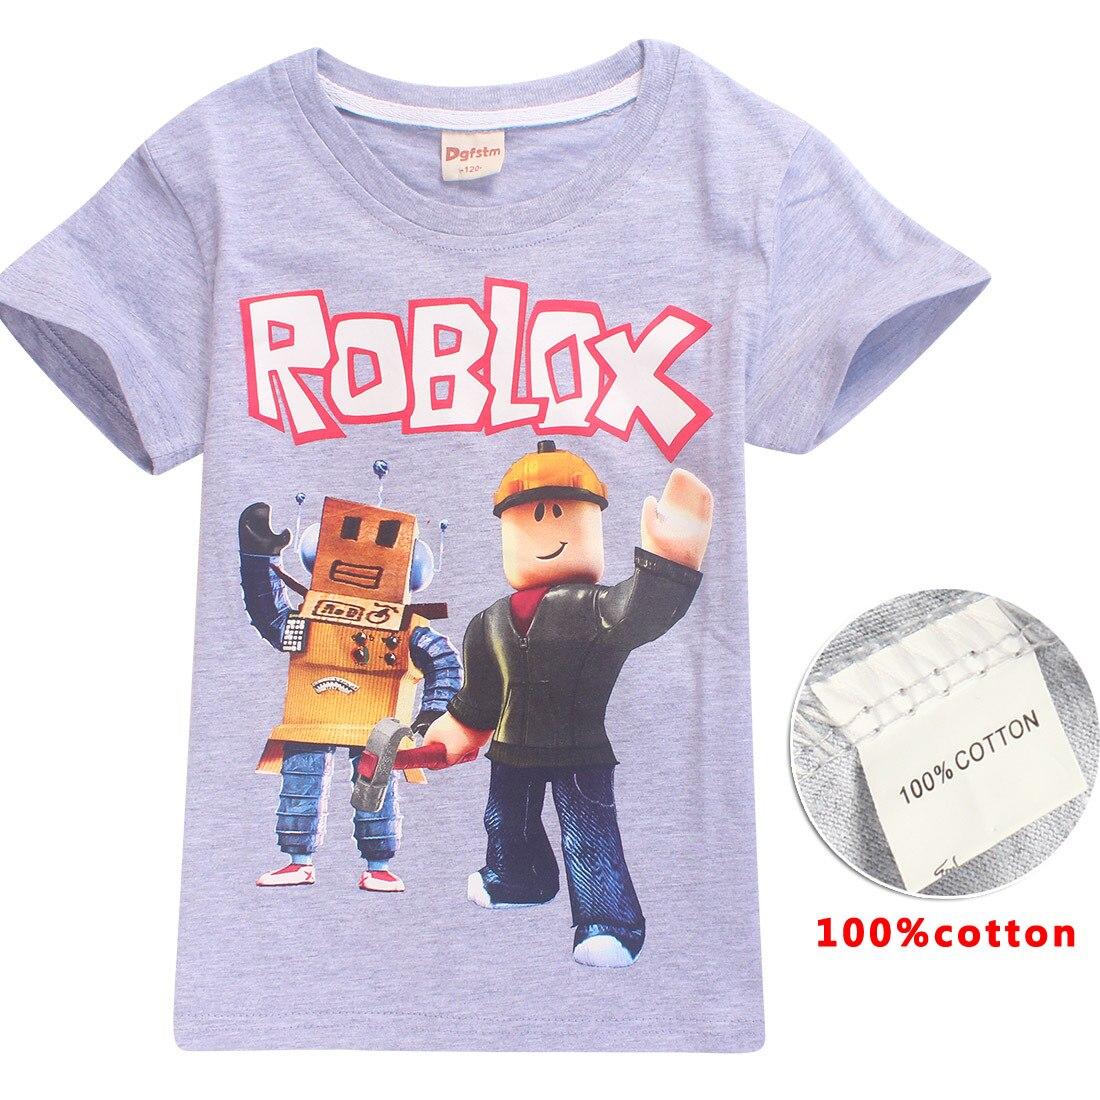 Roblox T Shirt Woman